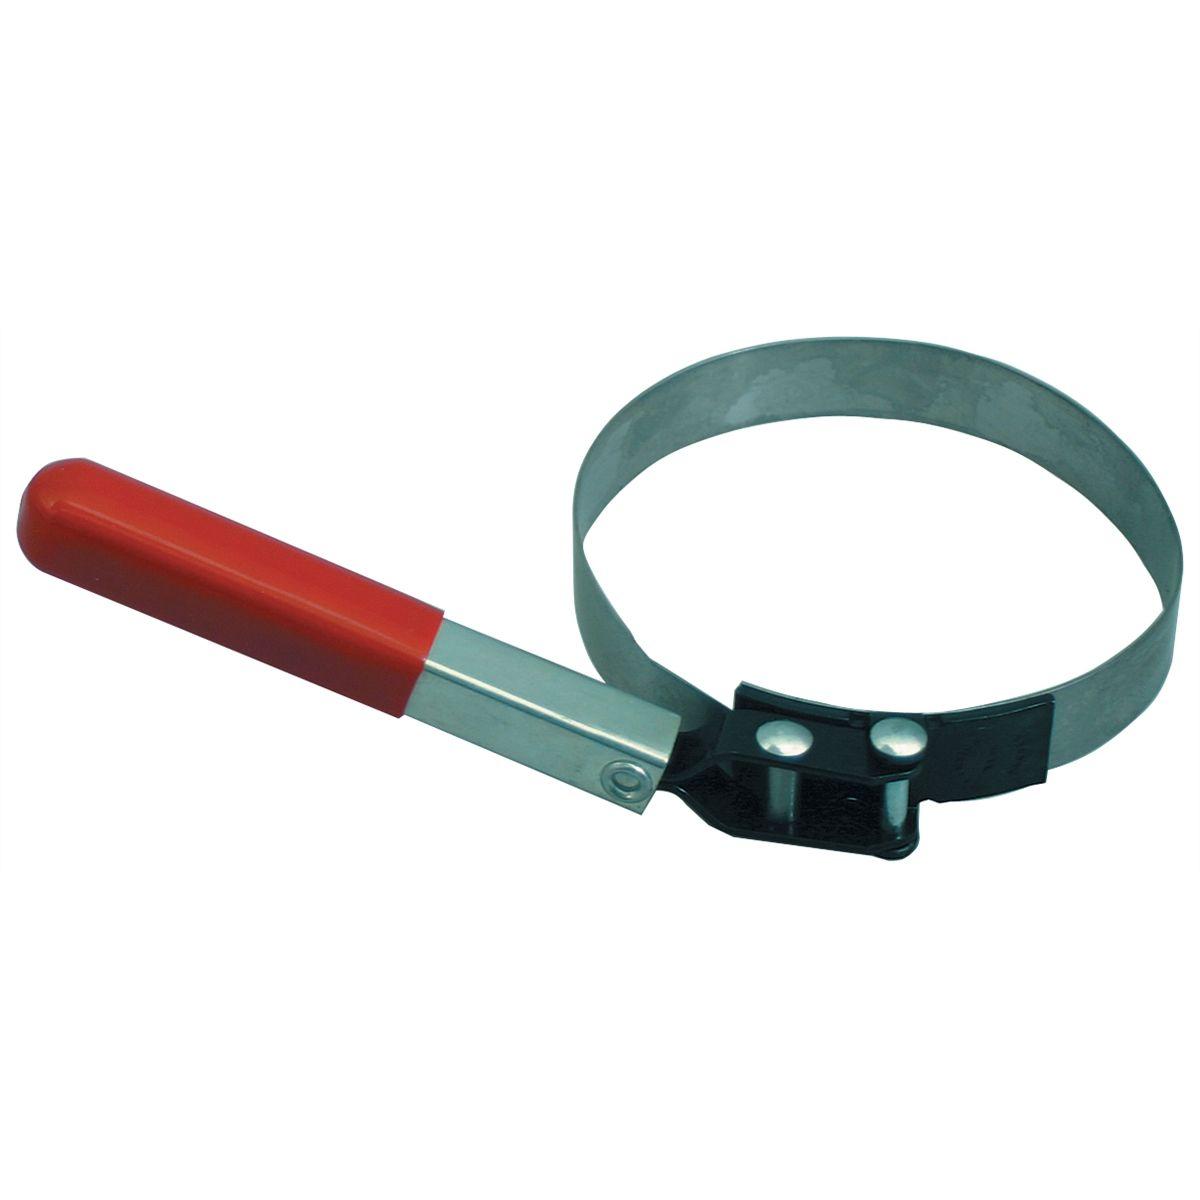 "PRO TUFF PLEWS Swivoil Oil Filter Wrench 2-13//16/"" To 3"